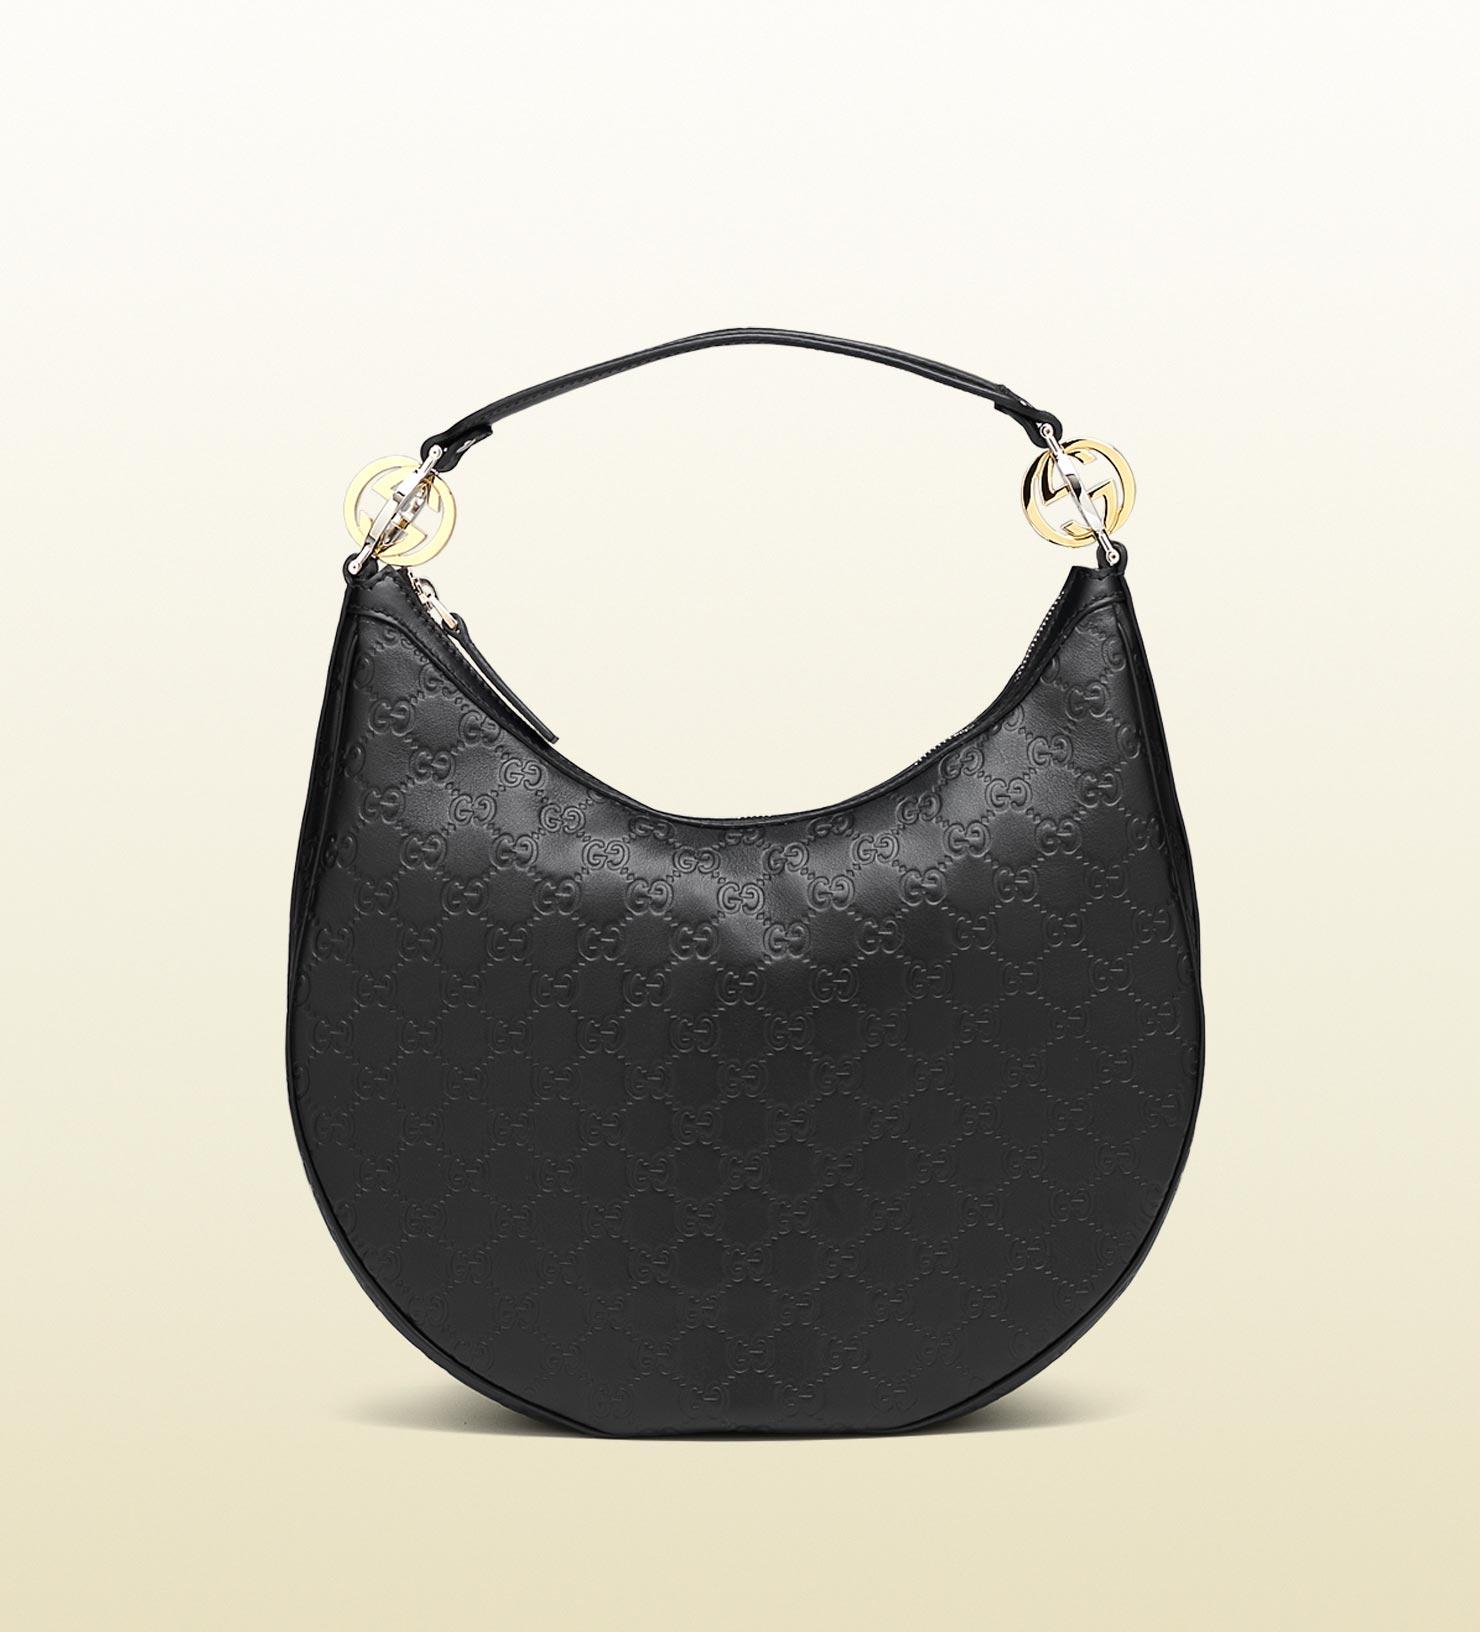 dd91b6d04d7e Gucci Black Gg Guccissima Leather Twins Interlocking Large Hobo Bag ...